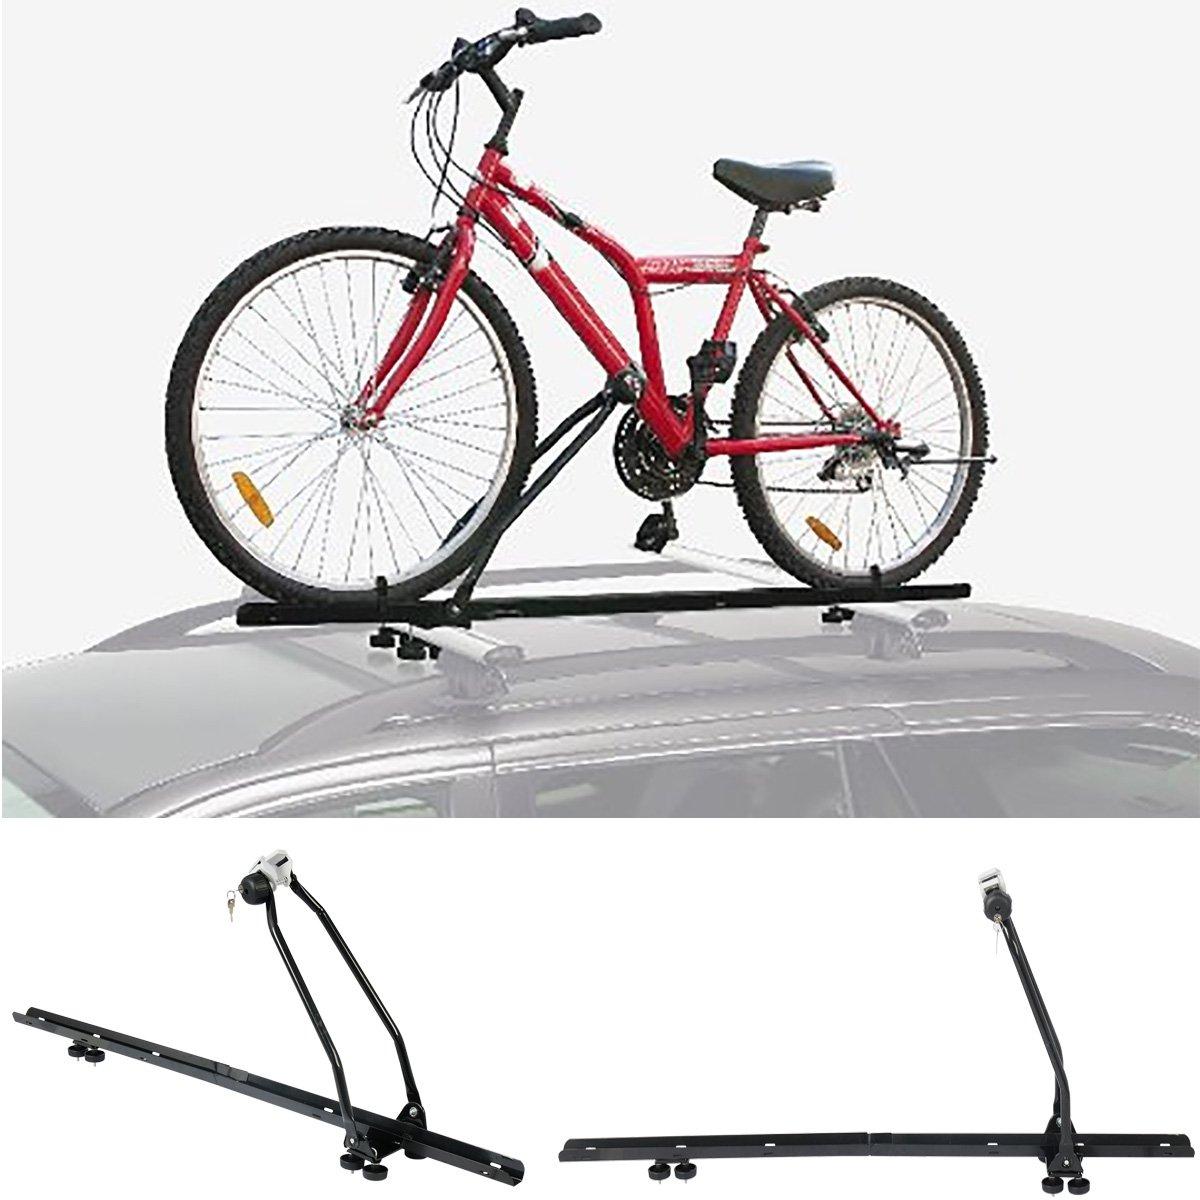 Woltu 4X Portabicicletas Baca Techo Soporte para Auto Coche barandilla Bicicleta Bike con Cerradura Hierro FZU1118-4